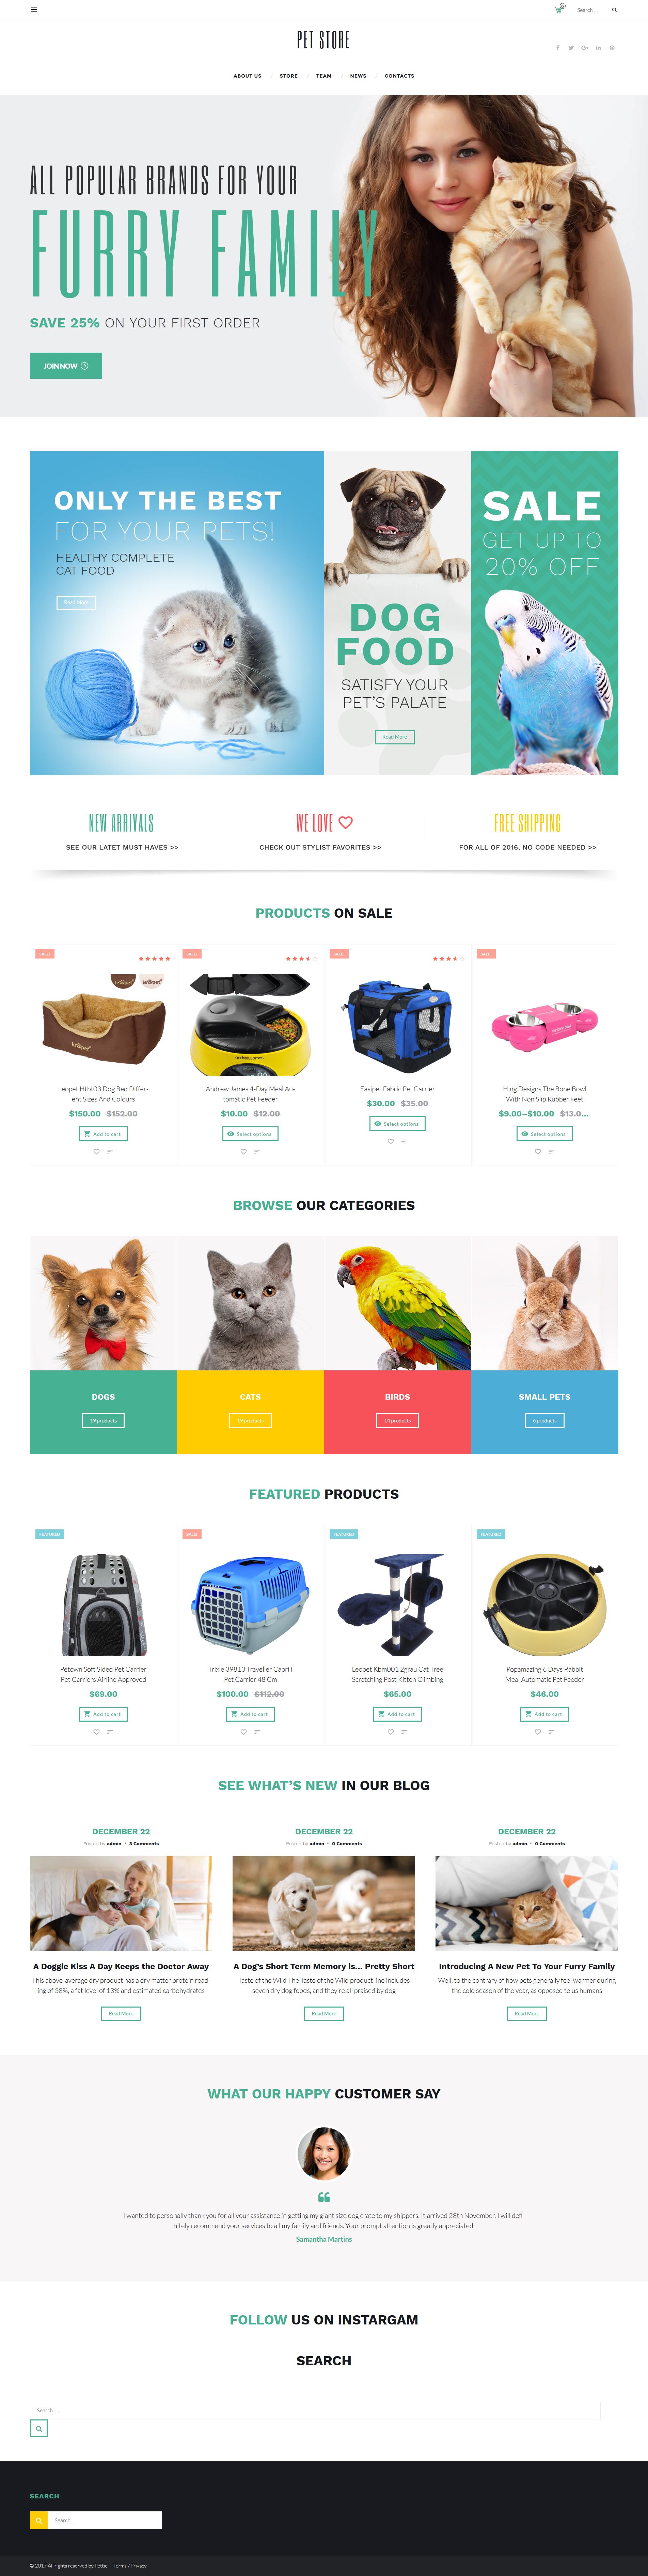 PetStore - адаптивный WooCommerce шаблон для зоомагазина №58660 - скриншот